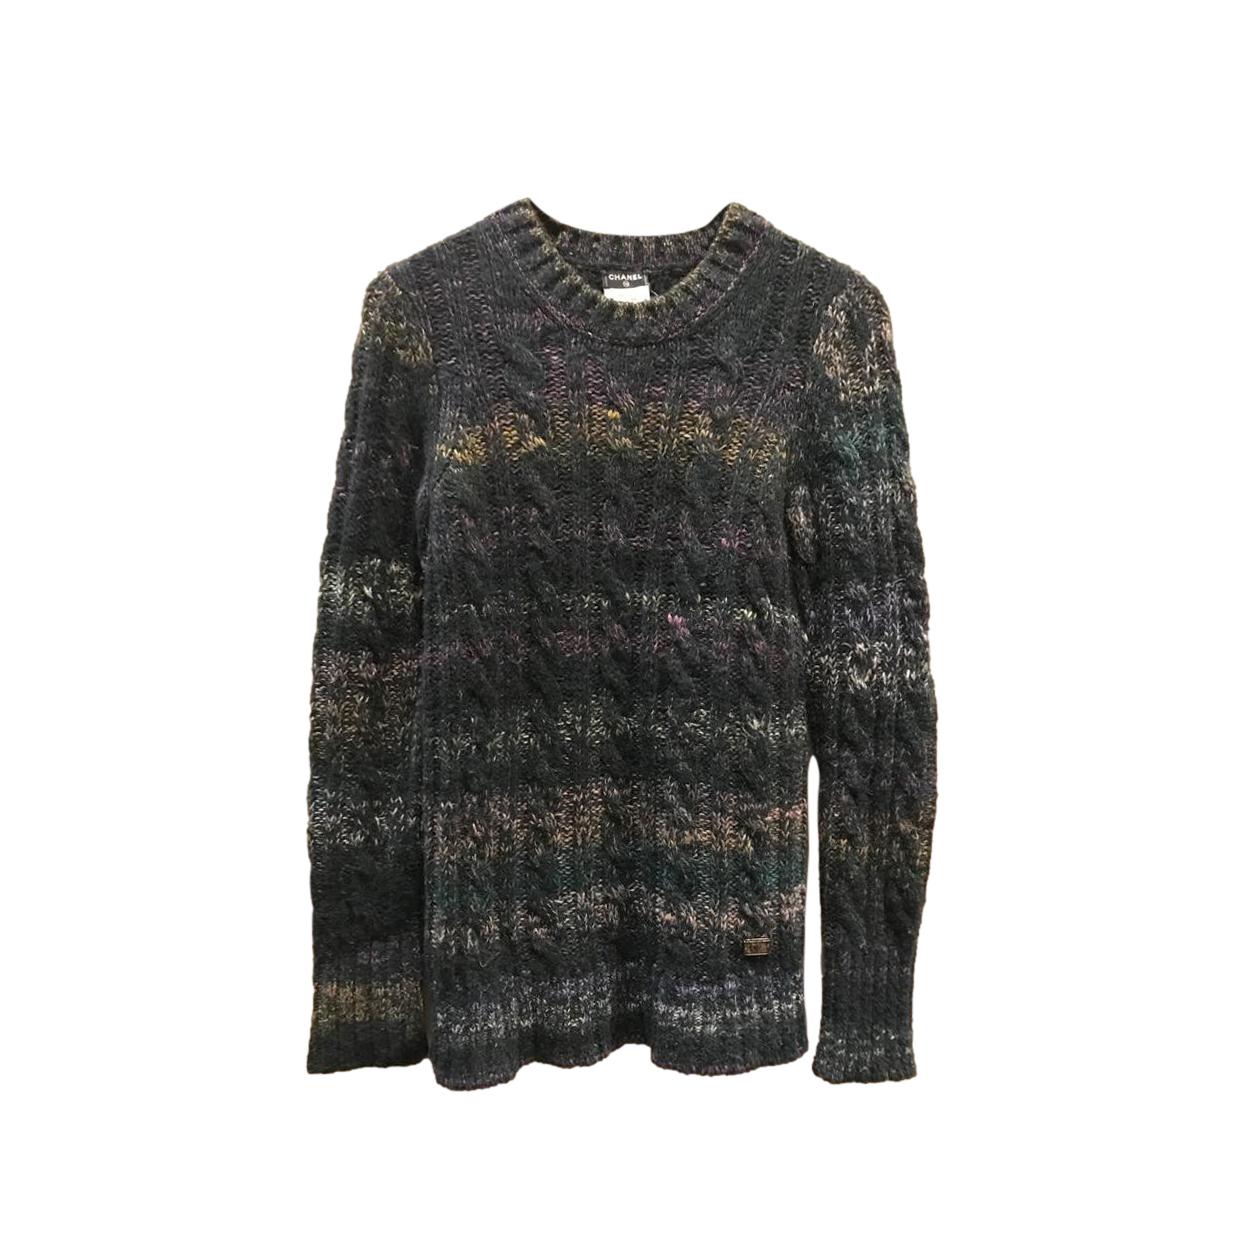 Chanel Multicoloured Cashmere Knit Jumper